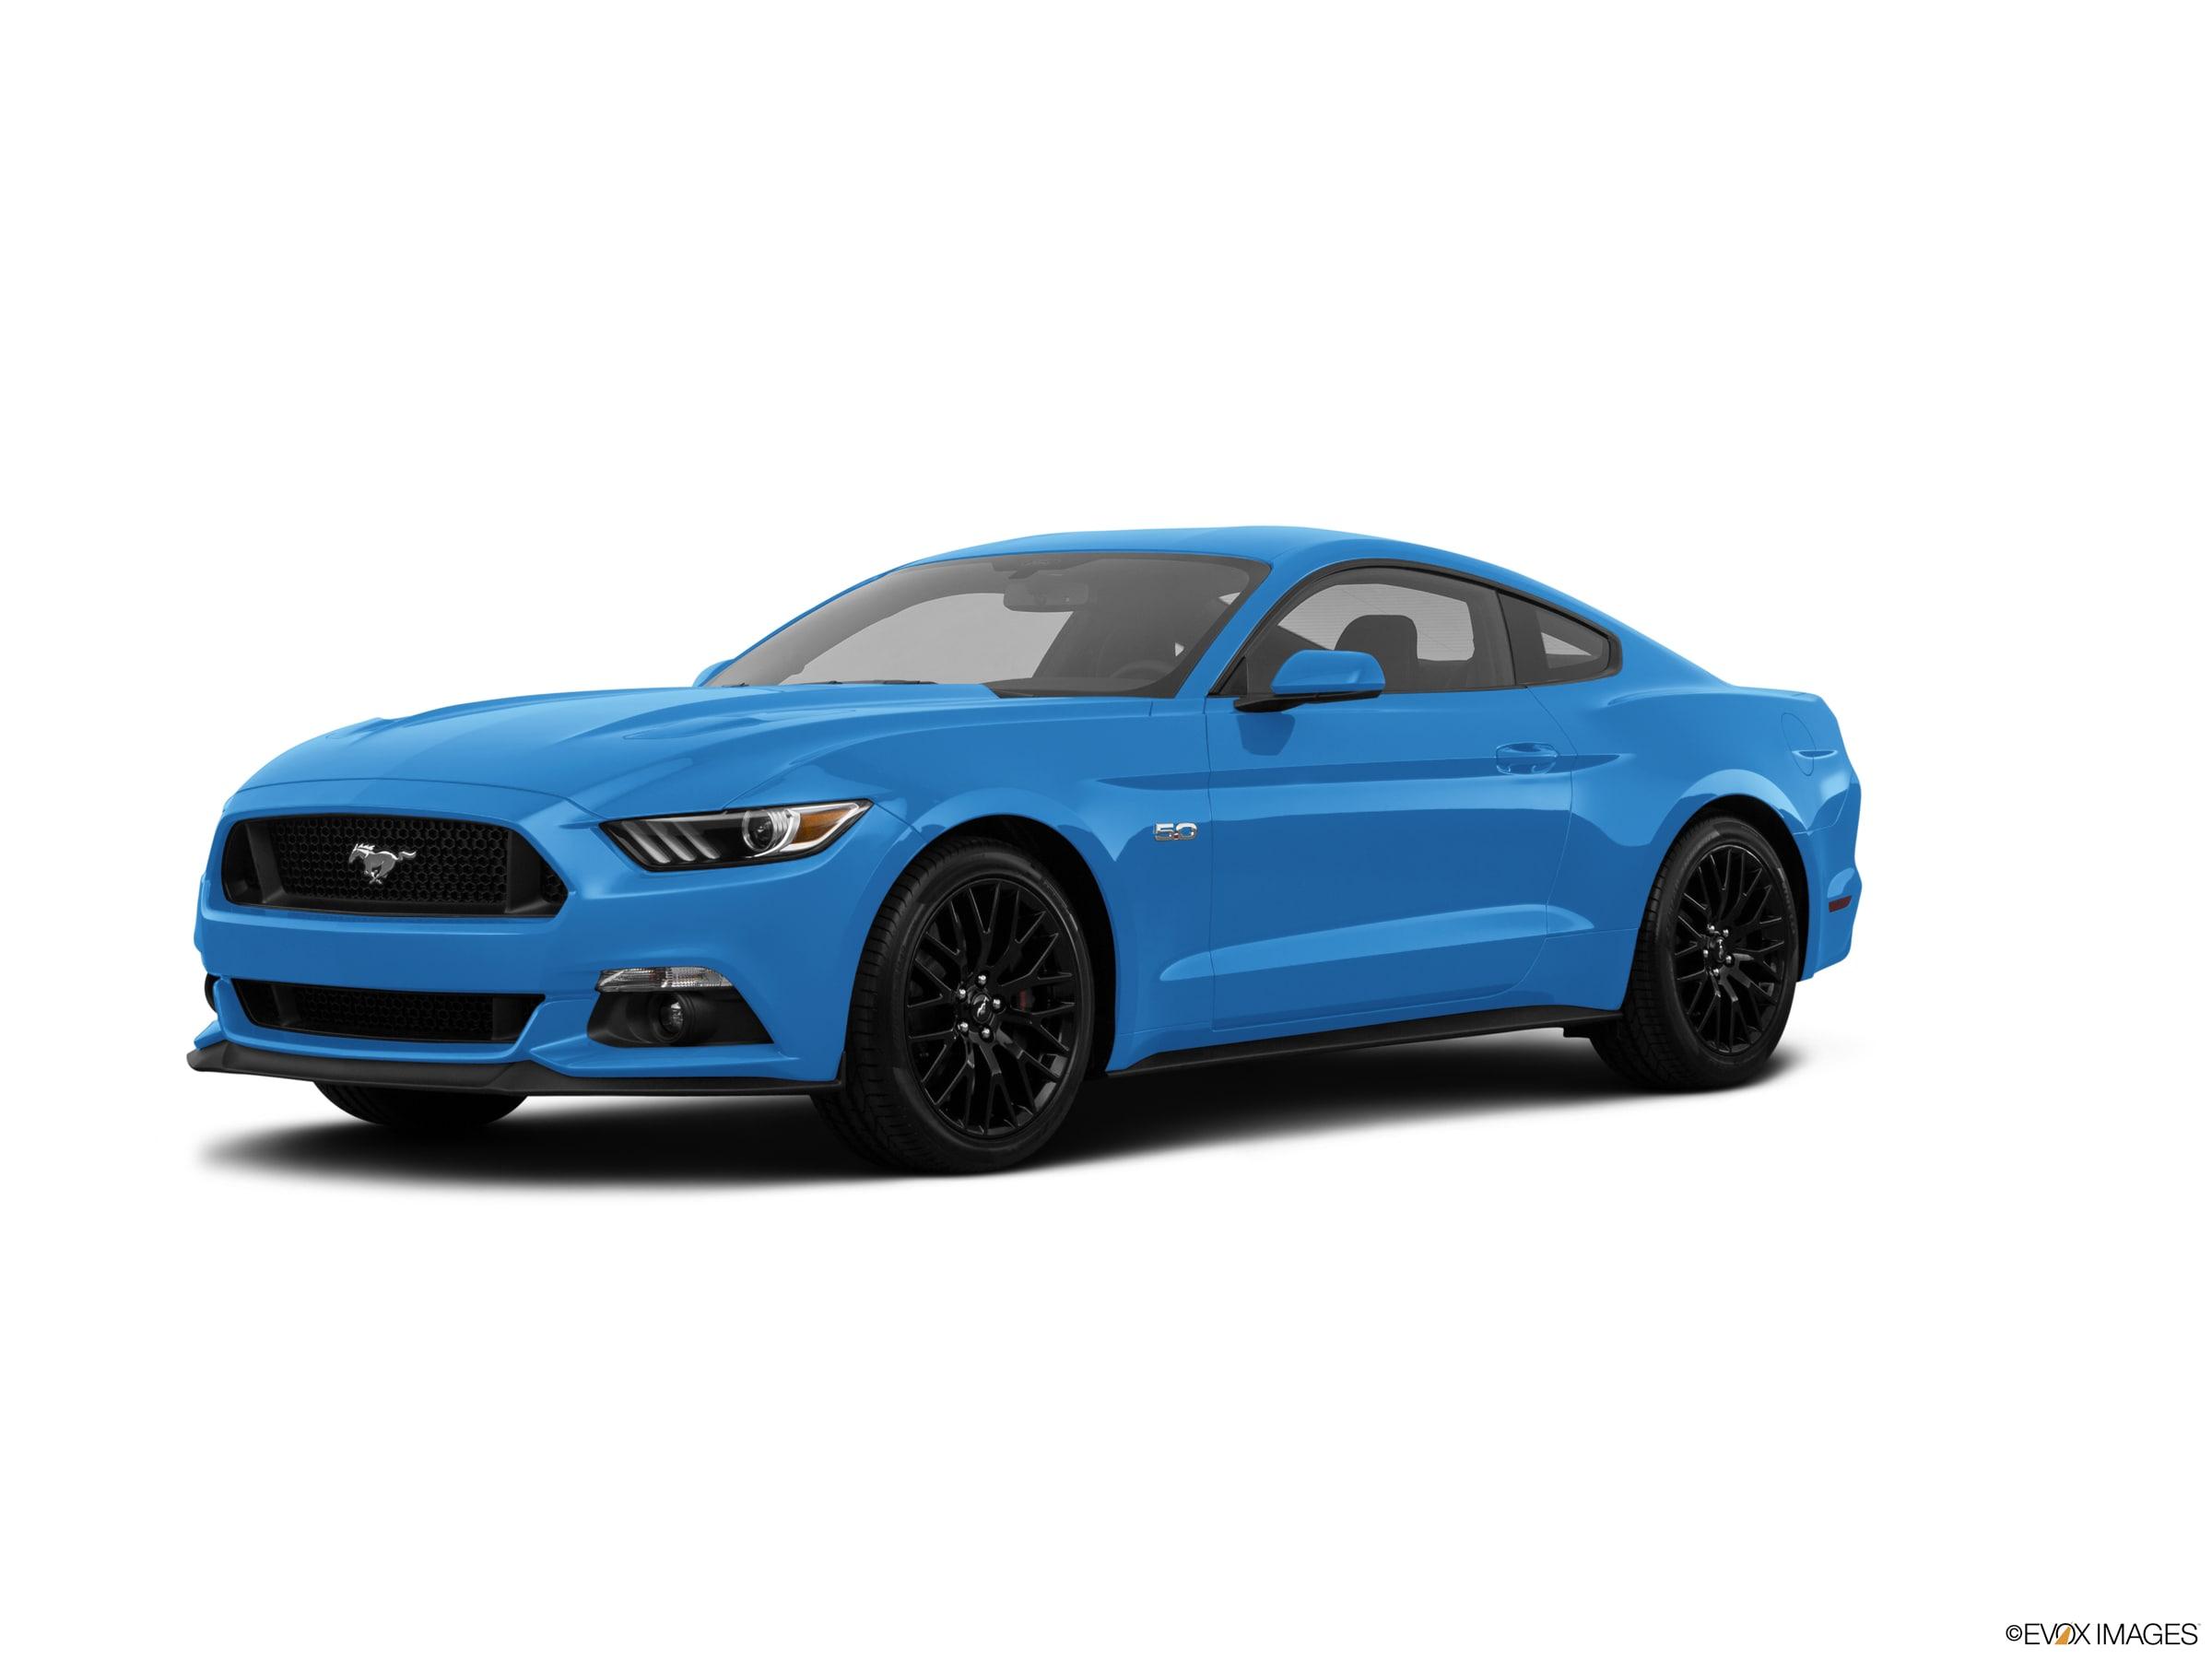 2017 Ford Mustang Car